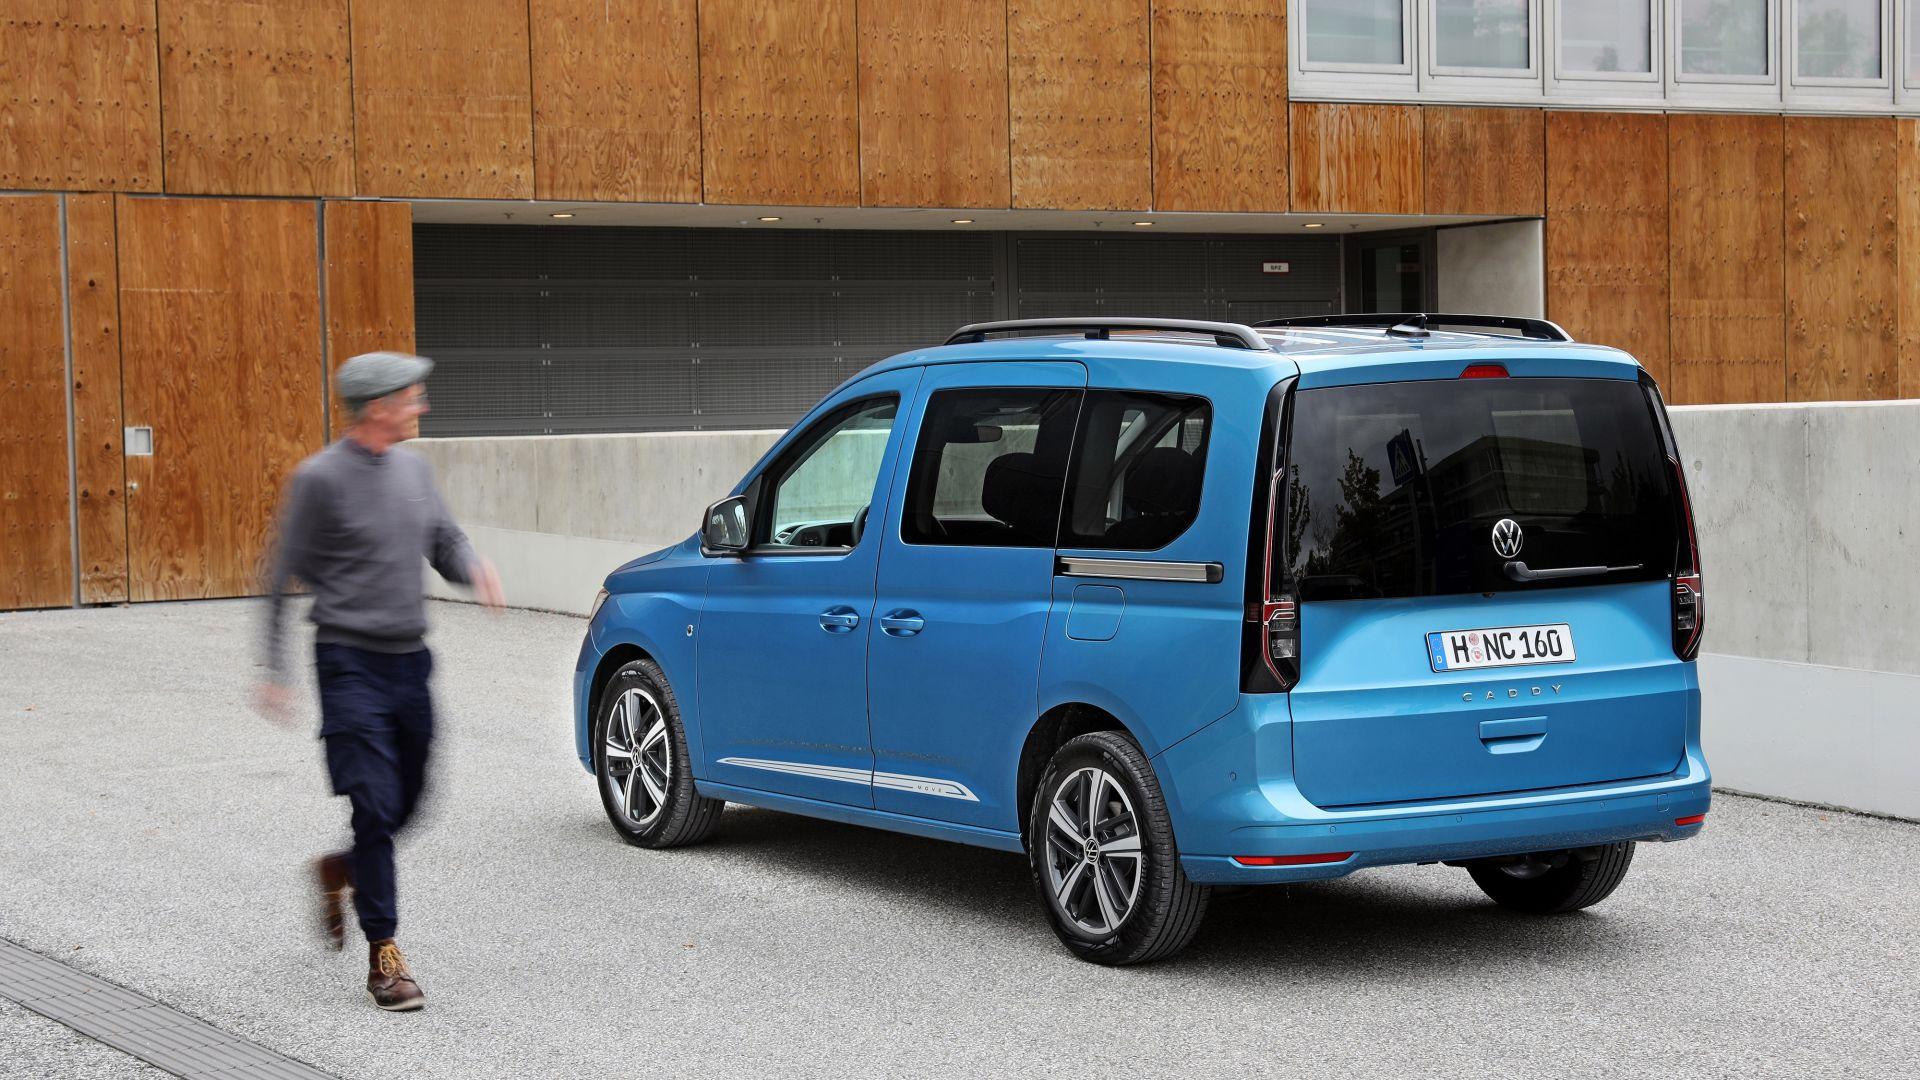 nuovo volkswagen caddy 2021: monovolume, camper e van